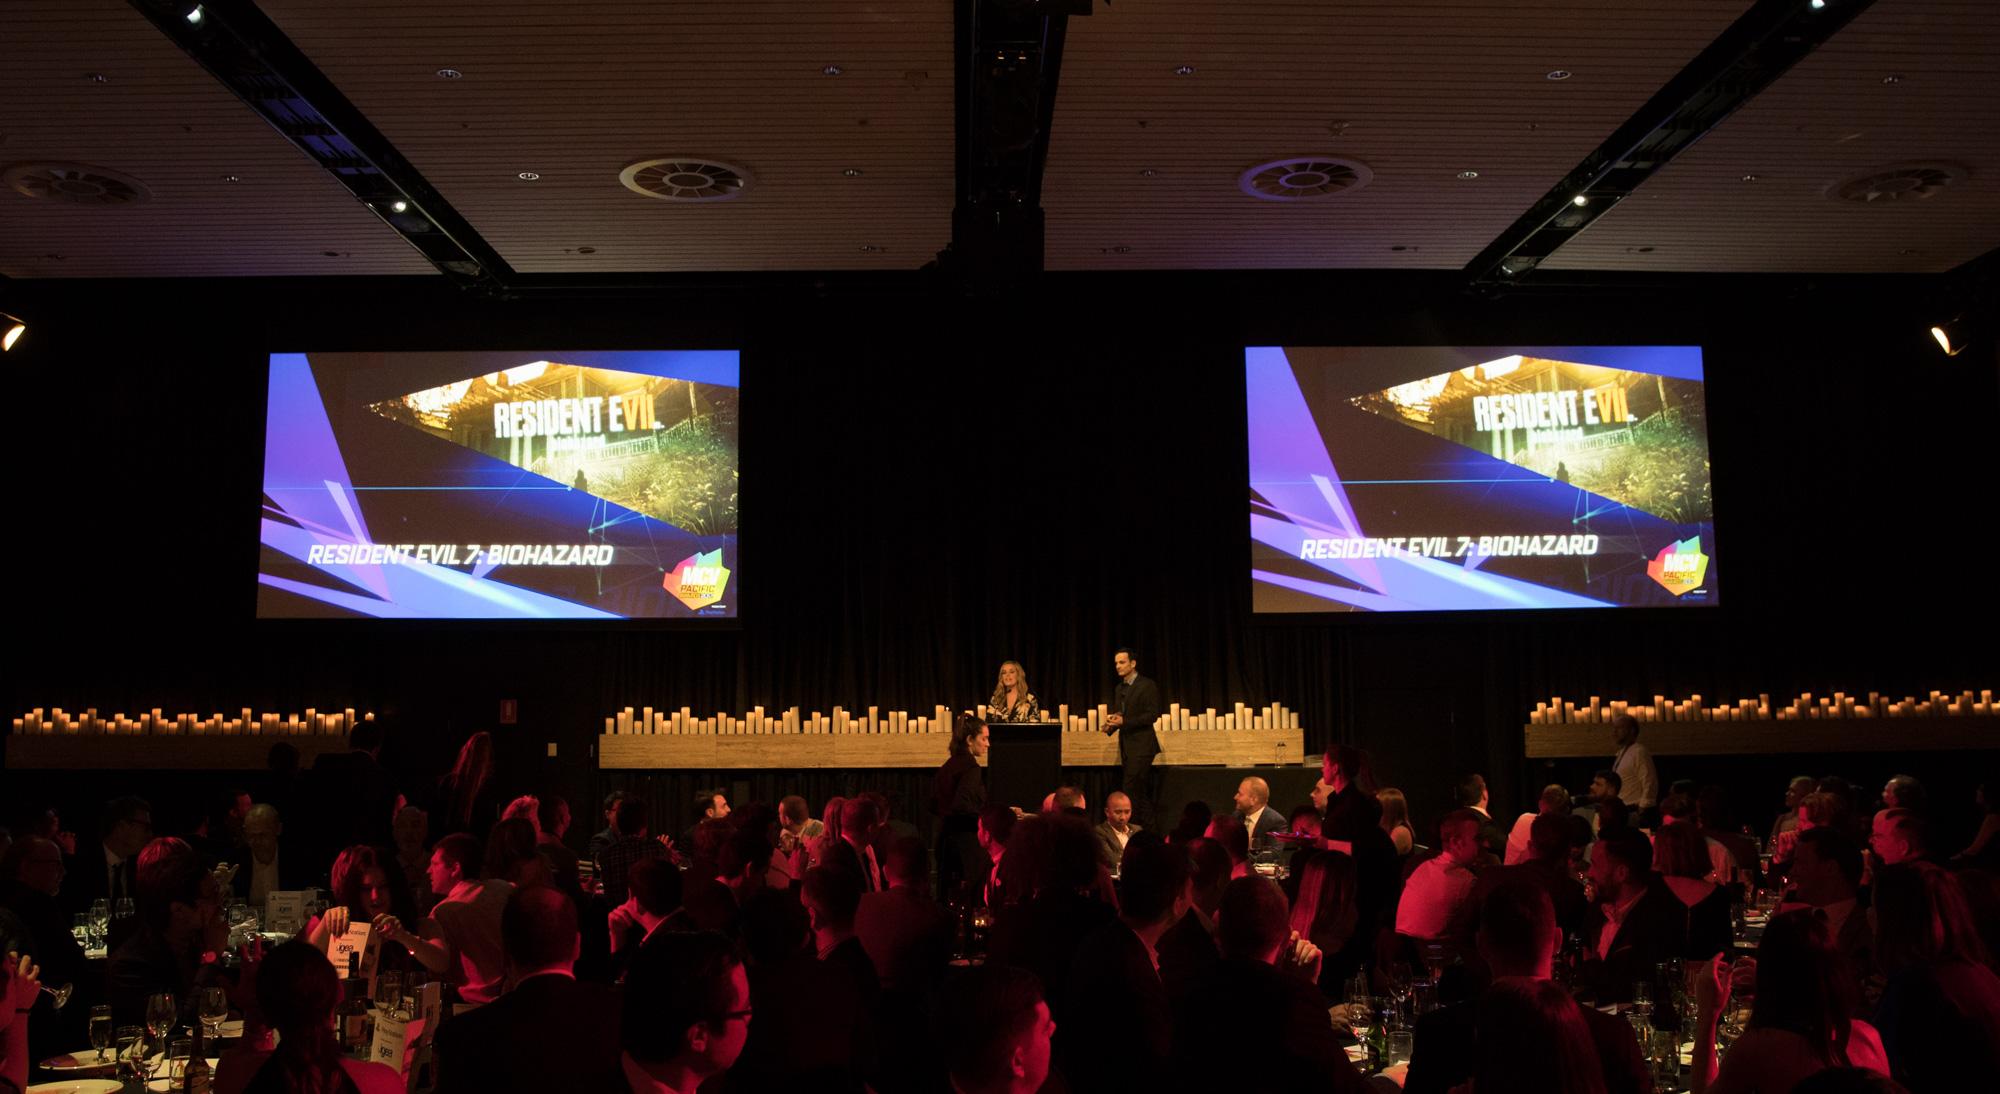 MCV_Pacific_Awards_1_June_17_PS_127.jpg